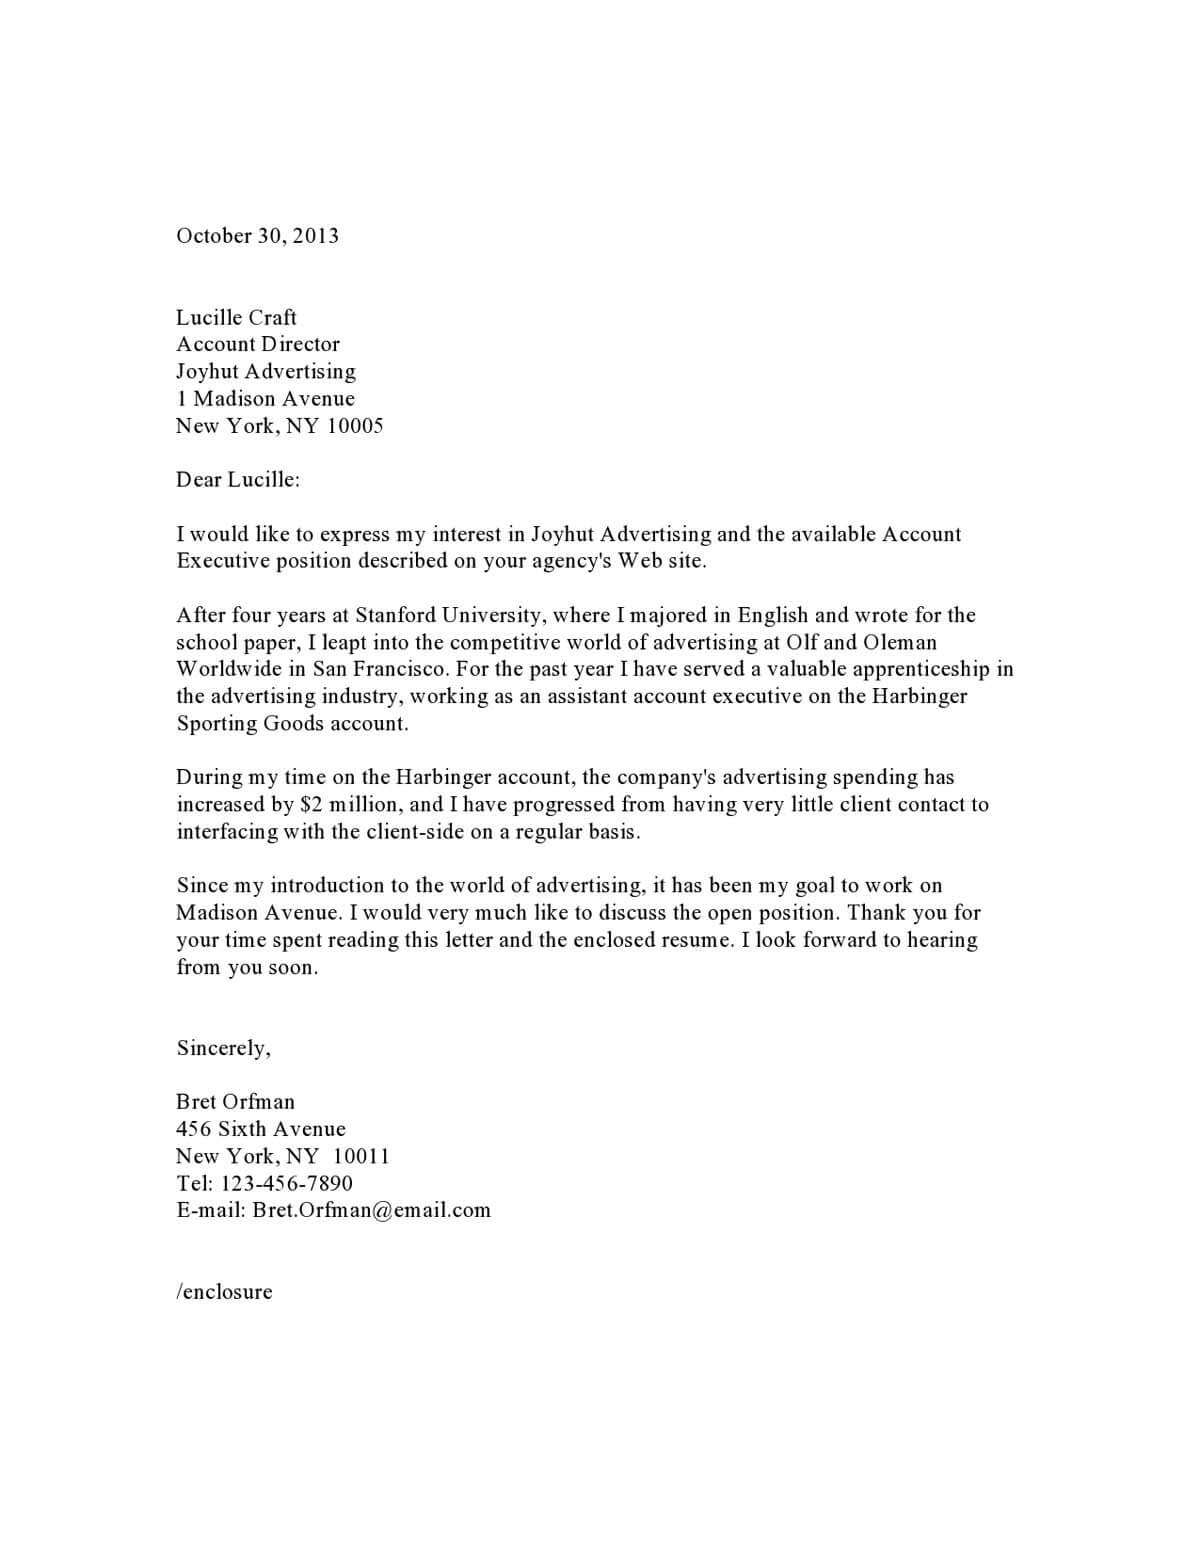 Surat Lamaran Pekerjaan Bahasa Inggris Berdasarkan Iklan